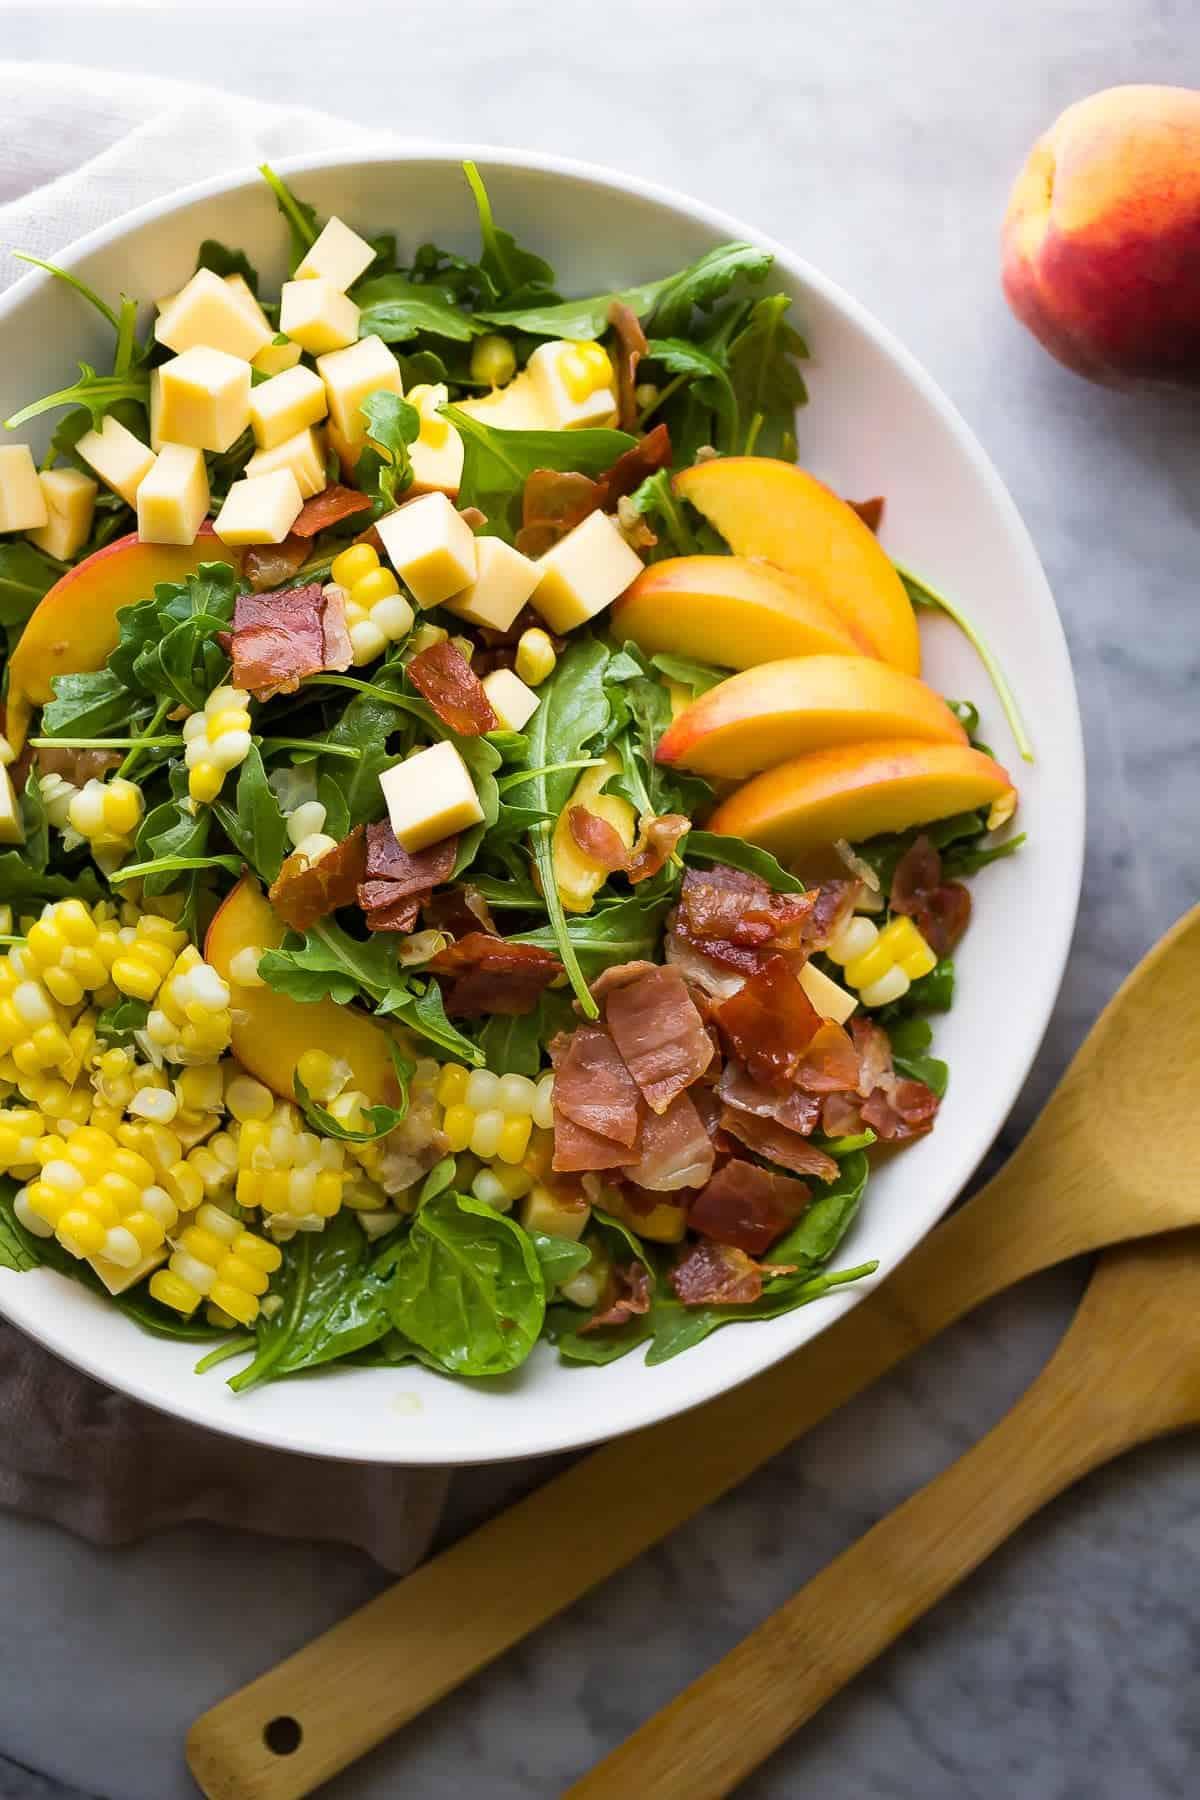 Corn and Peach Salad Recipe with Crispy Prosciutto and Smoked Gouda